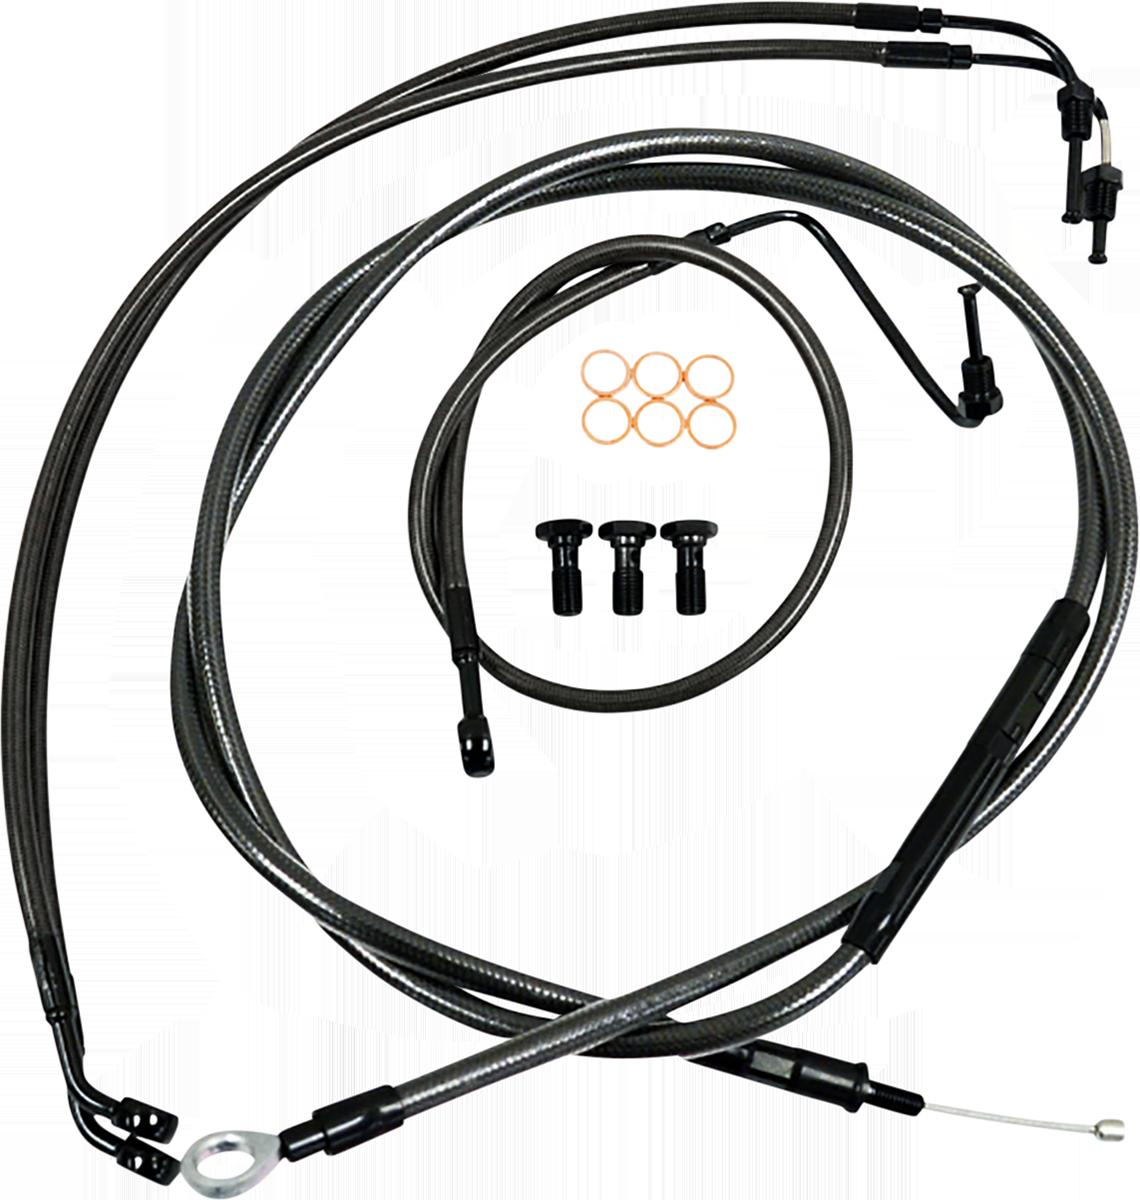 "La Choppers 10"" Black Ape Hanger Handlebar Cable Kit 2018-2021 Harley Softail"